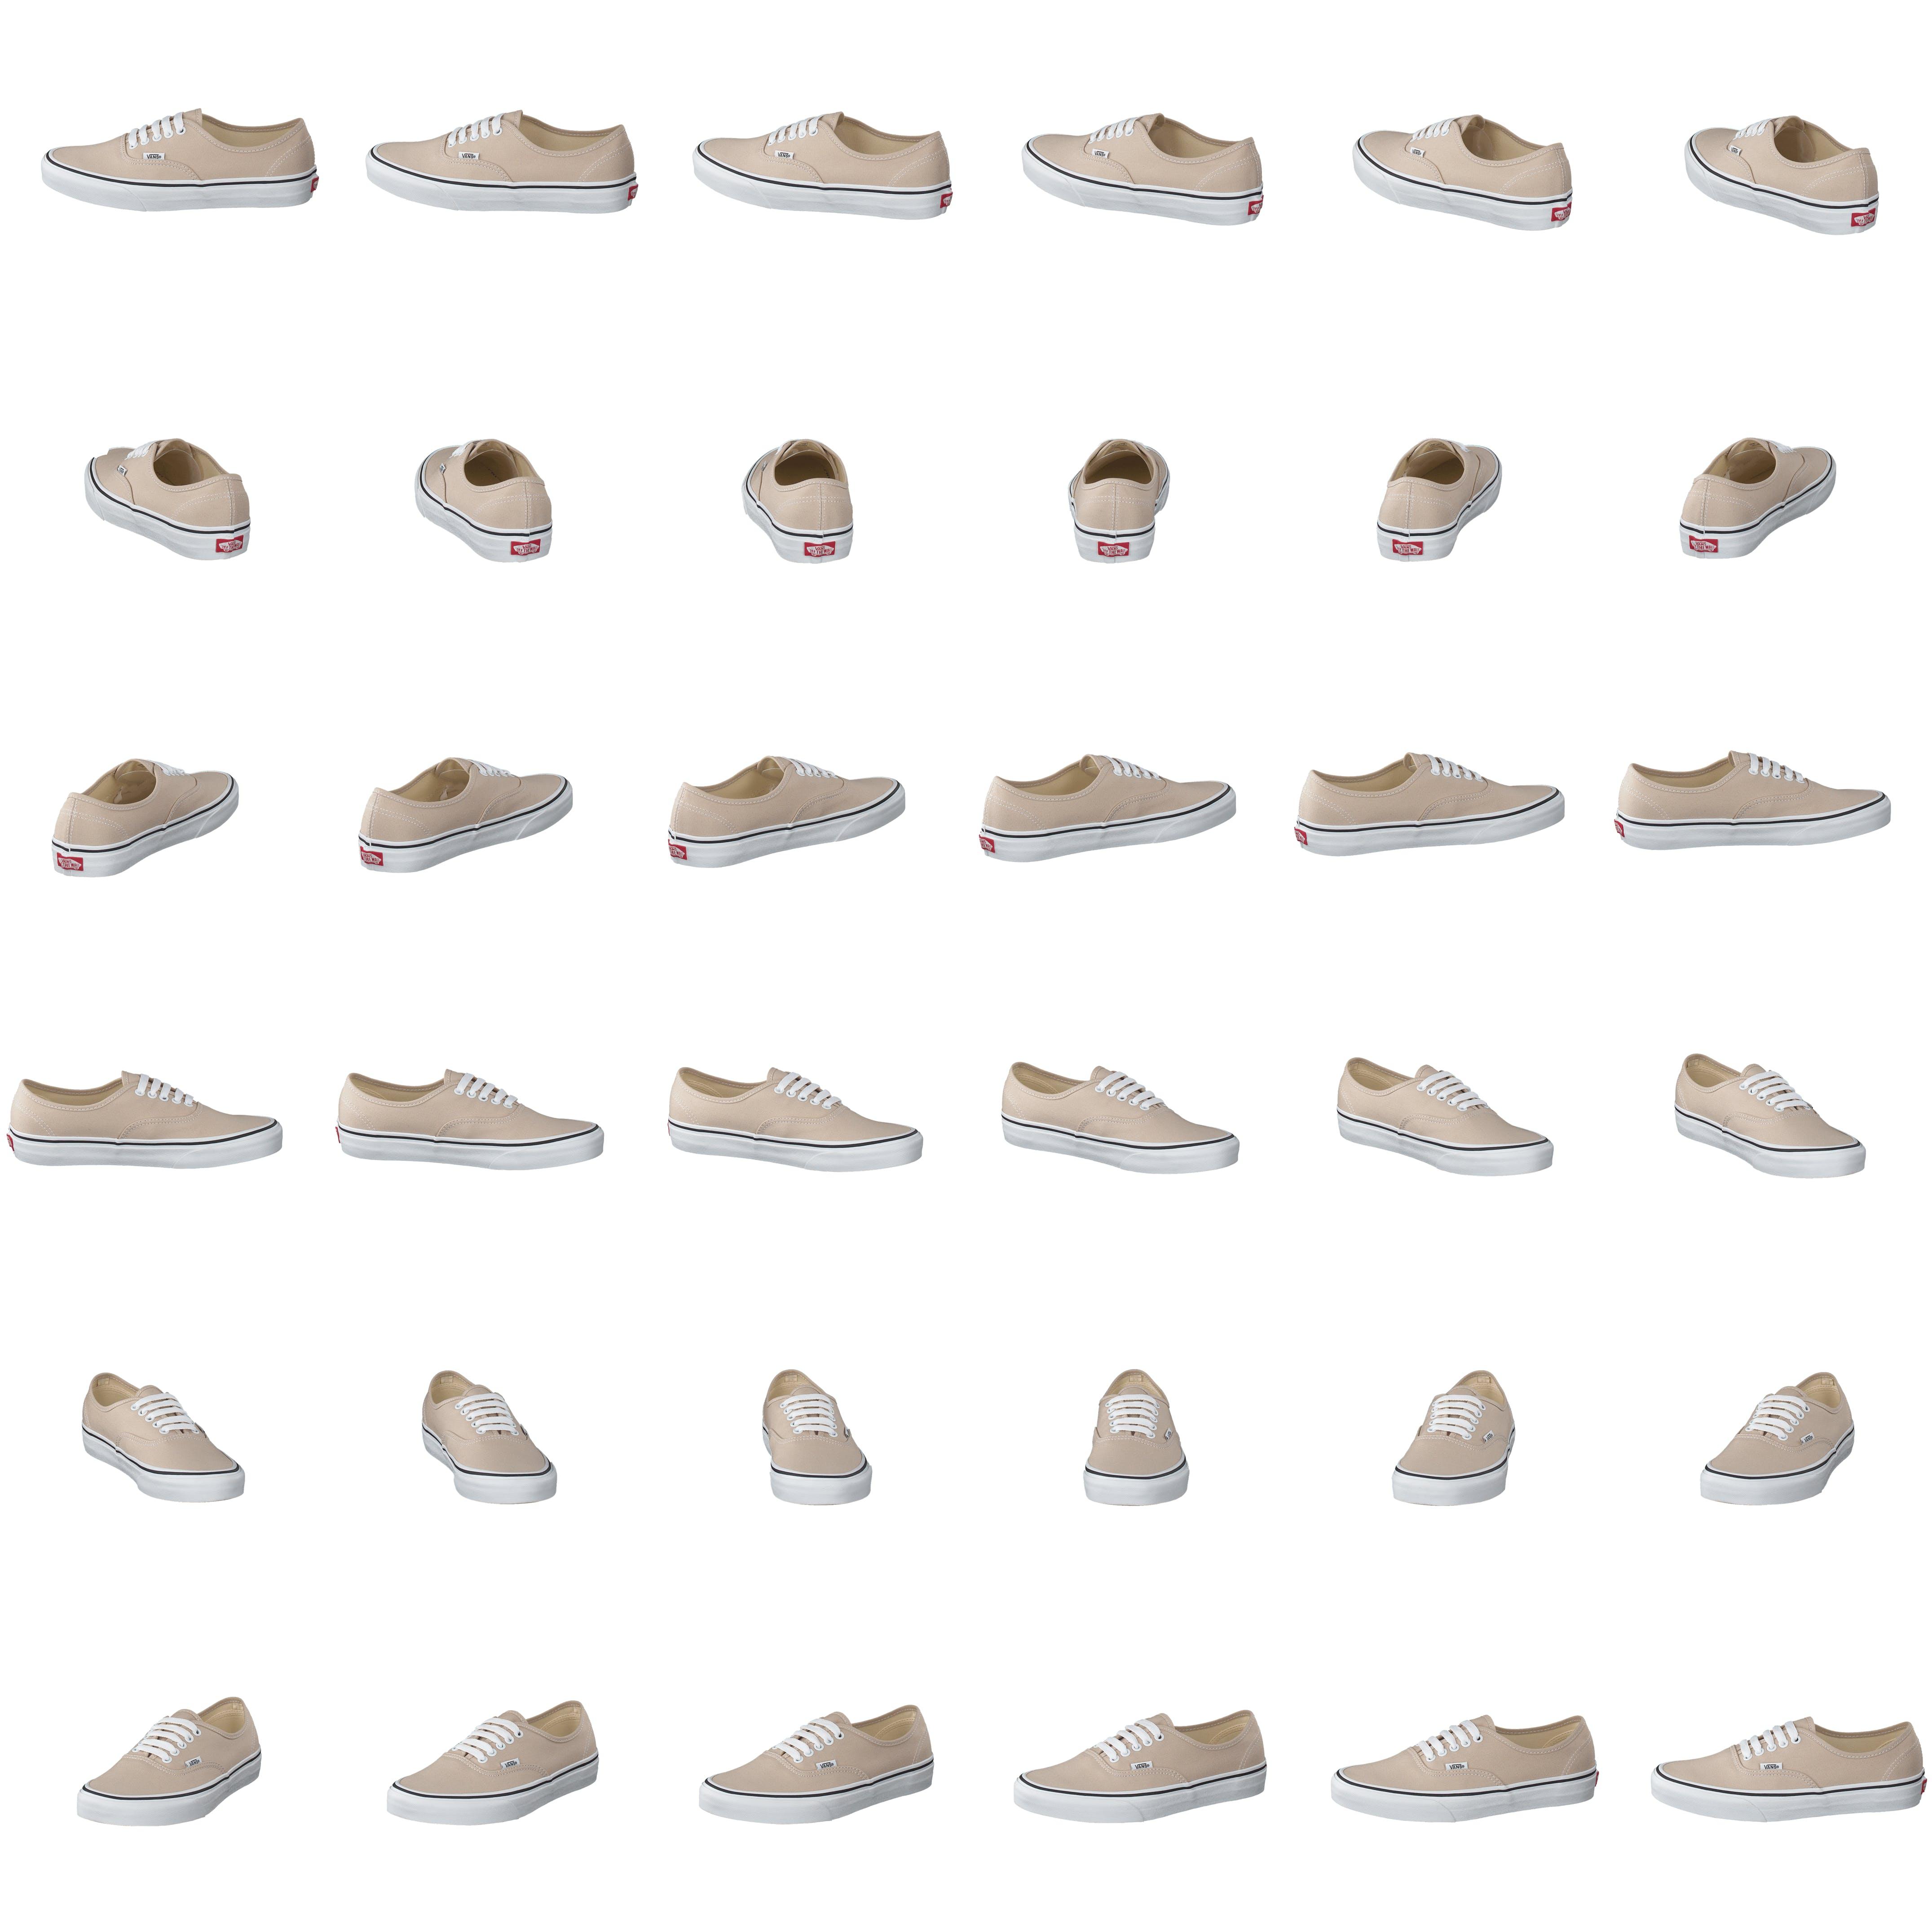 Kjøp Vans Ua Authentic Silver Liningtrue White sko Online